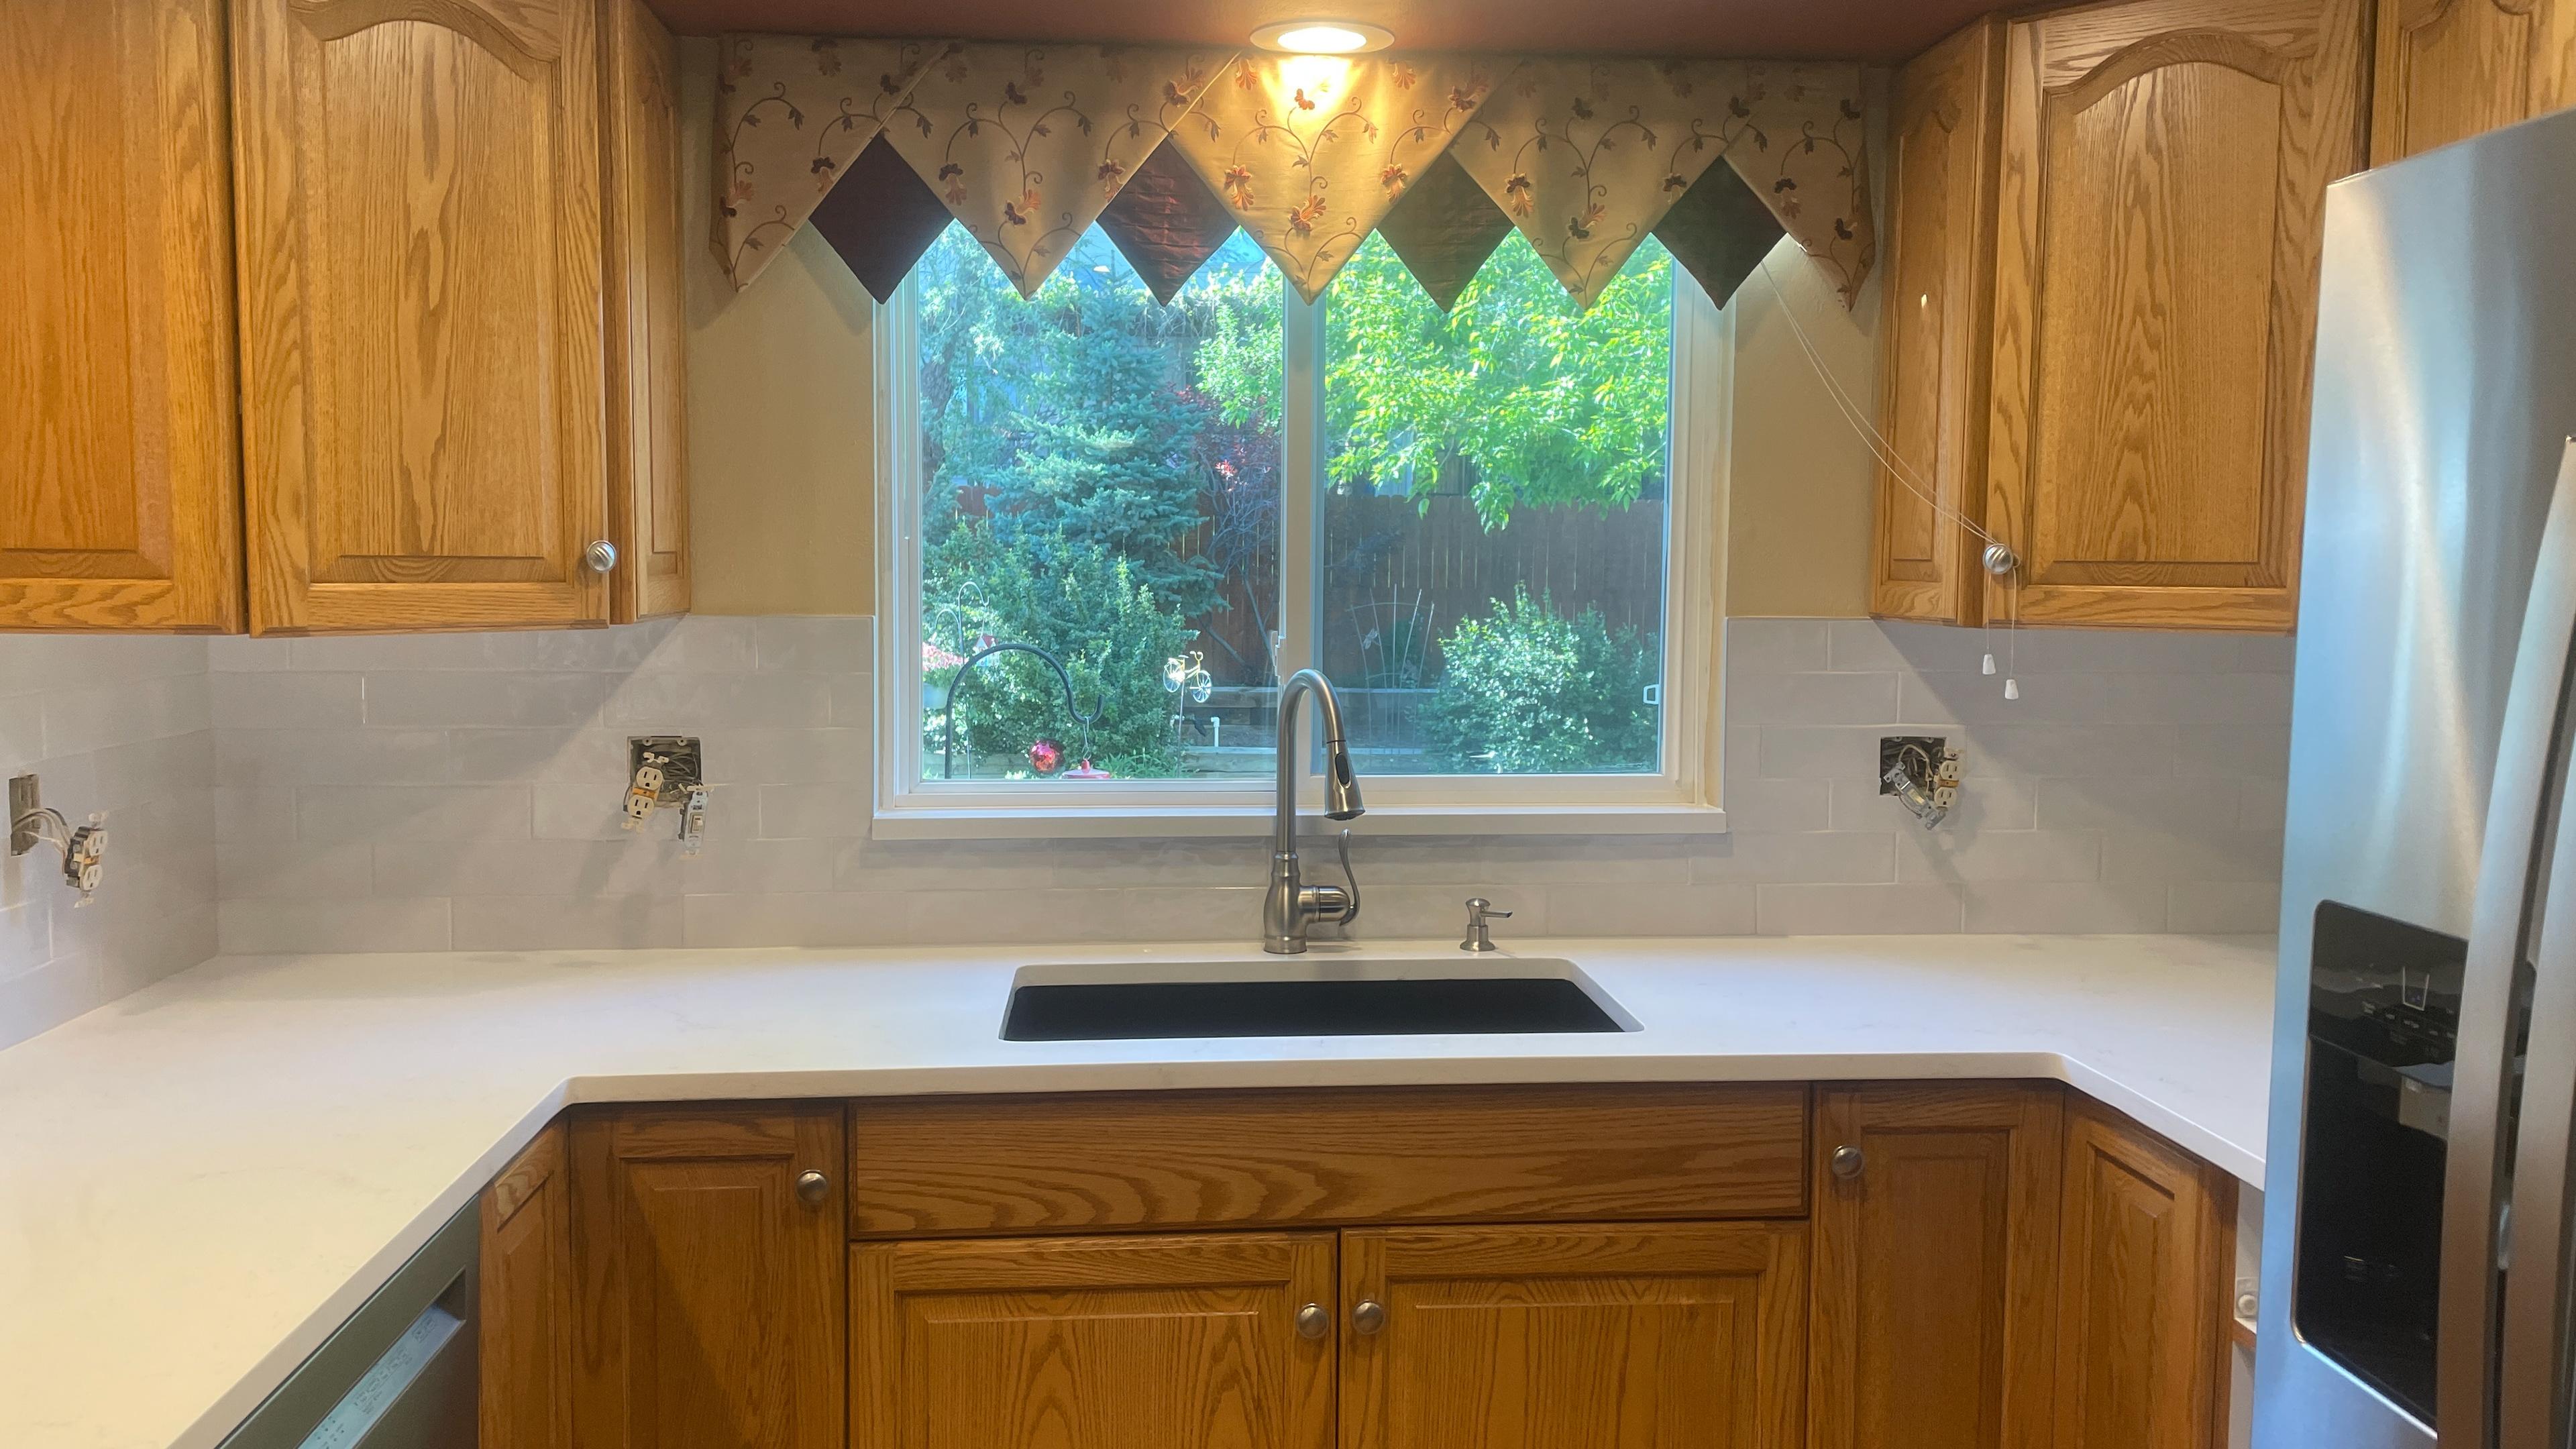 Home Design Business Remodeling Projects Backsplash Kitchen Centennial Co